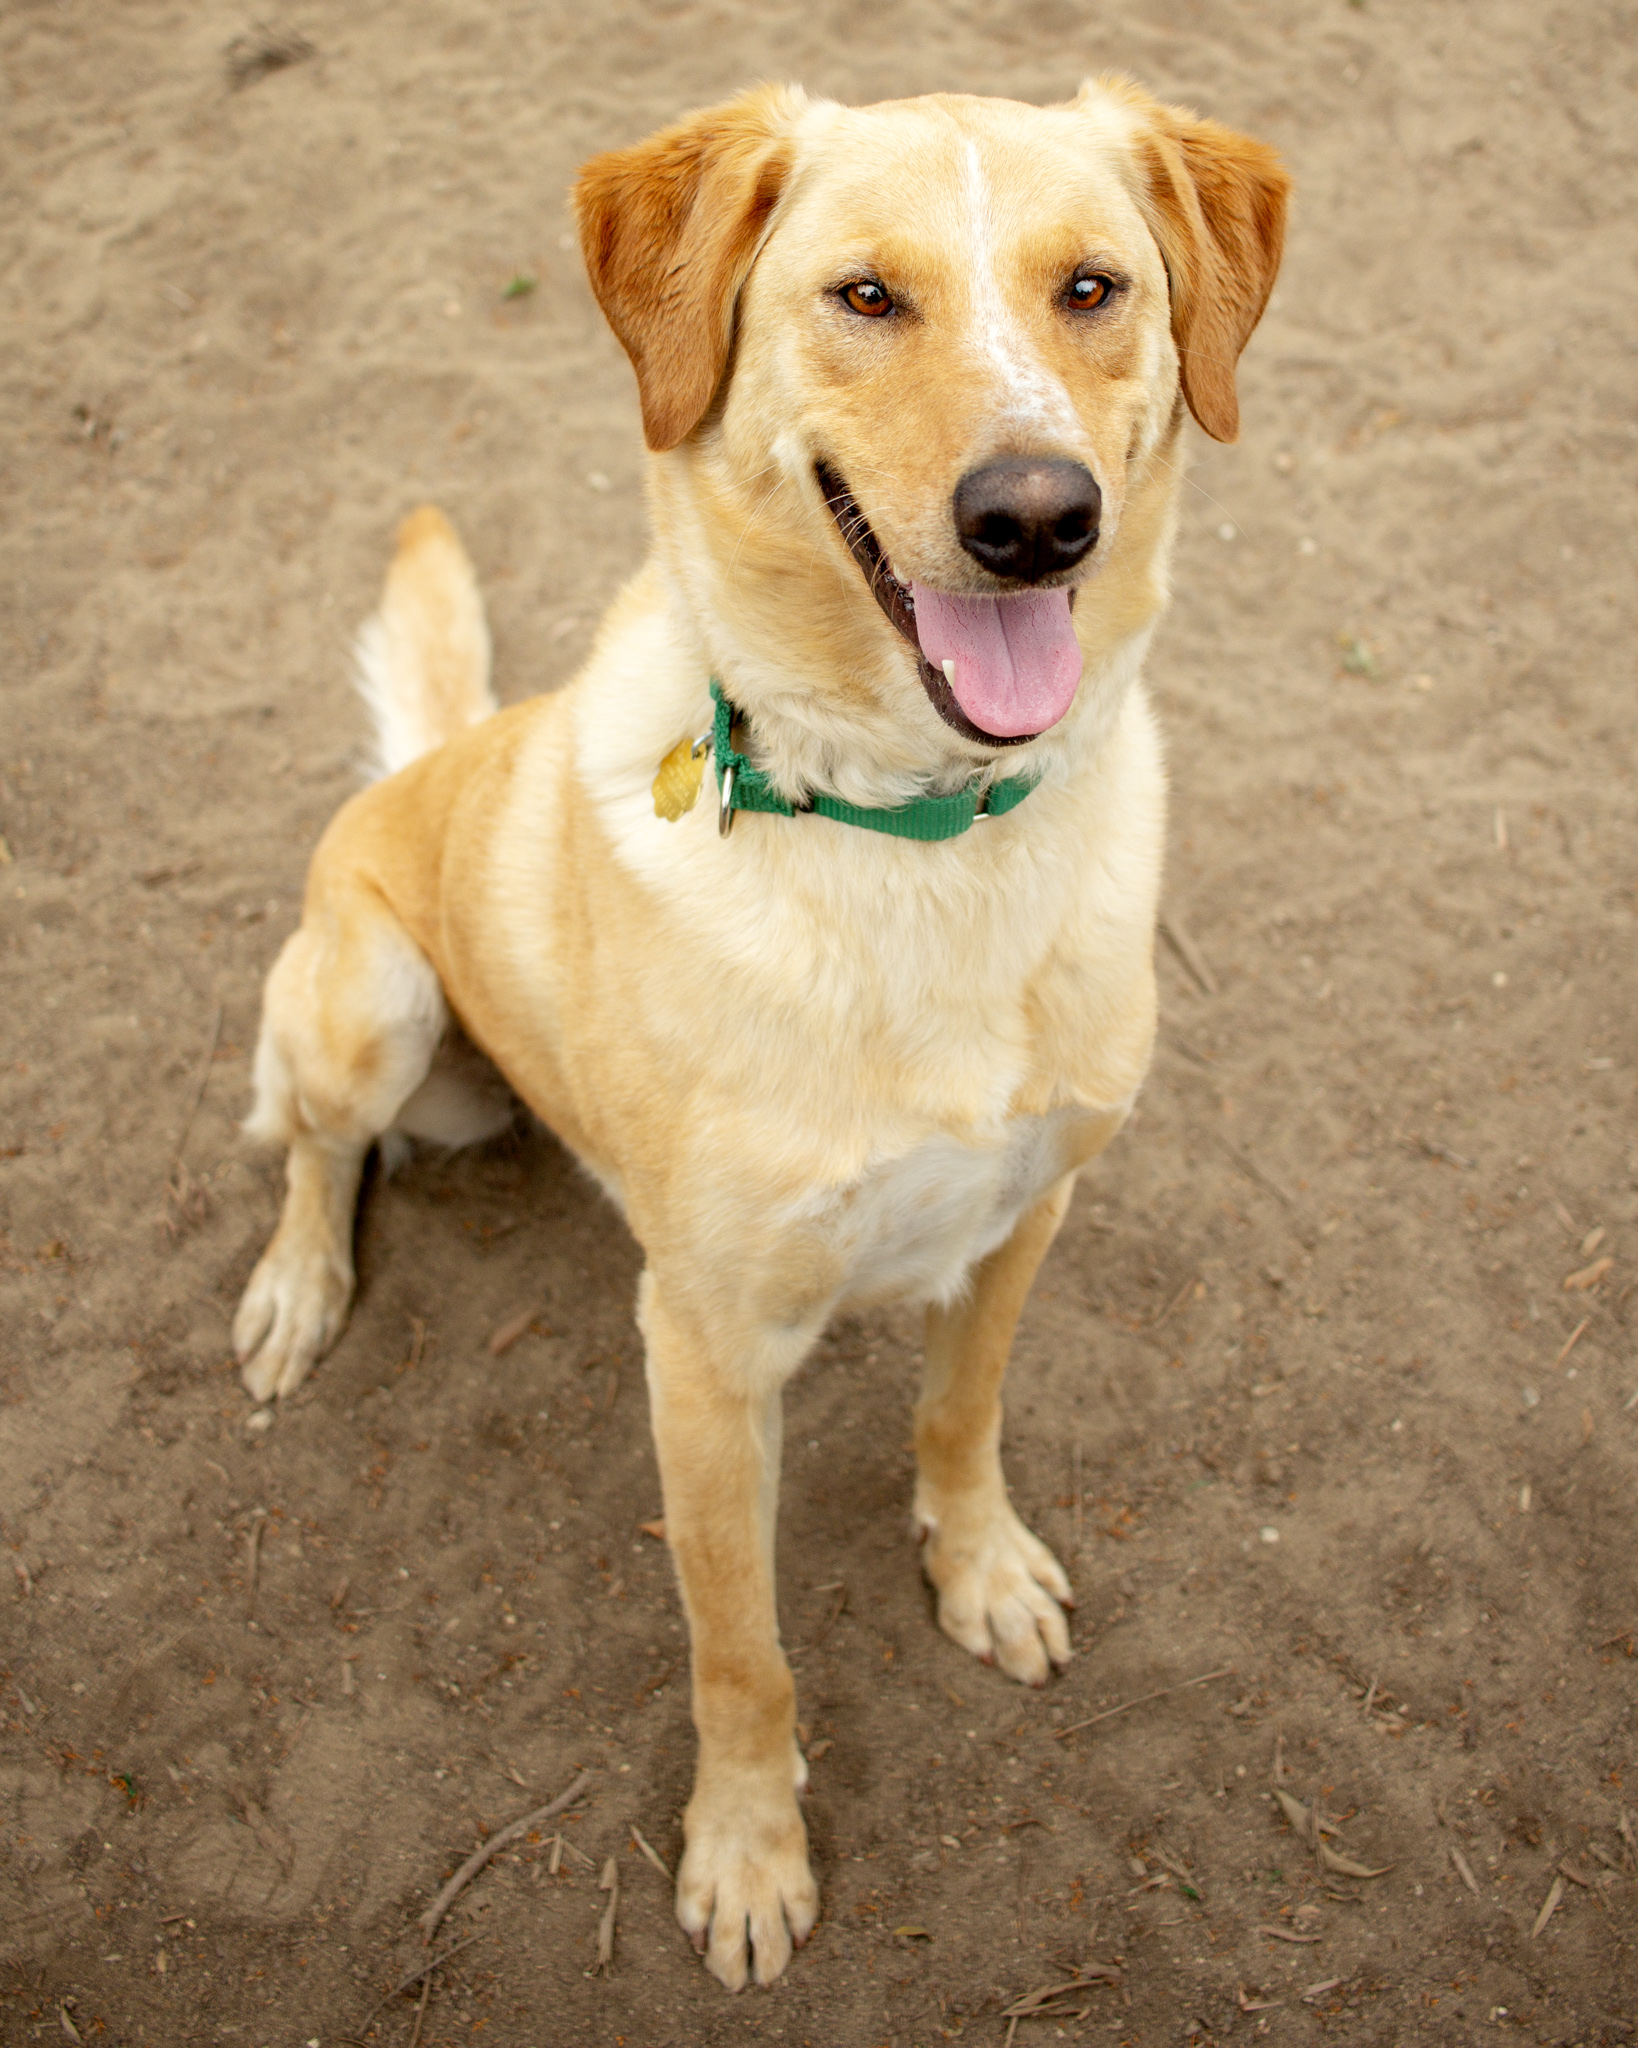 393-Orange-County-Dog-Photography-Steamer-Lee-Southern-California-SBACC.JPG